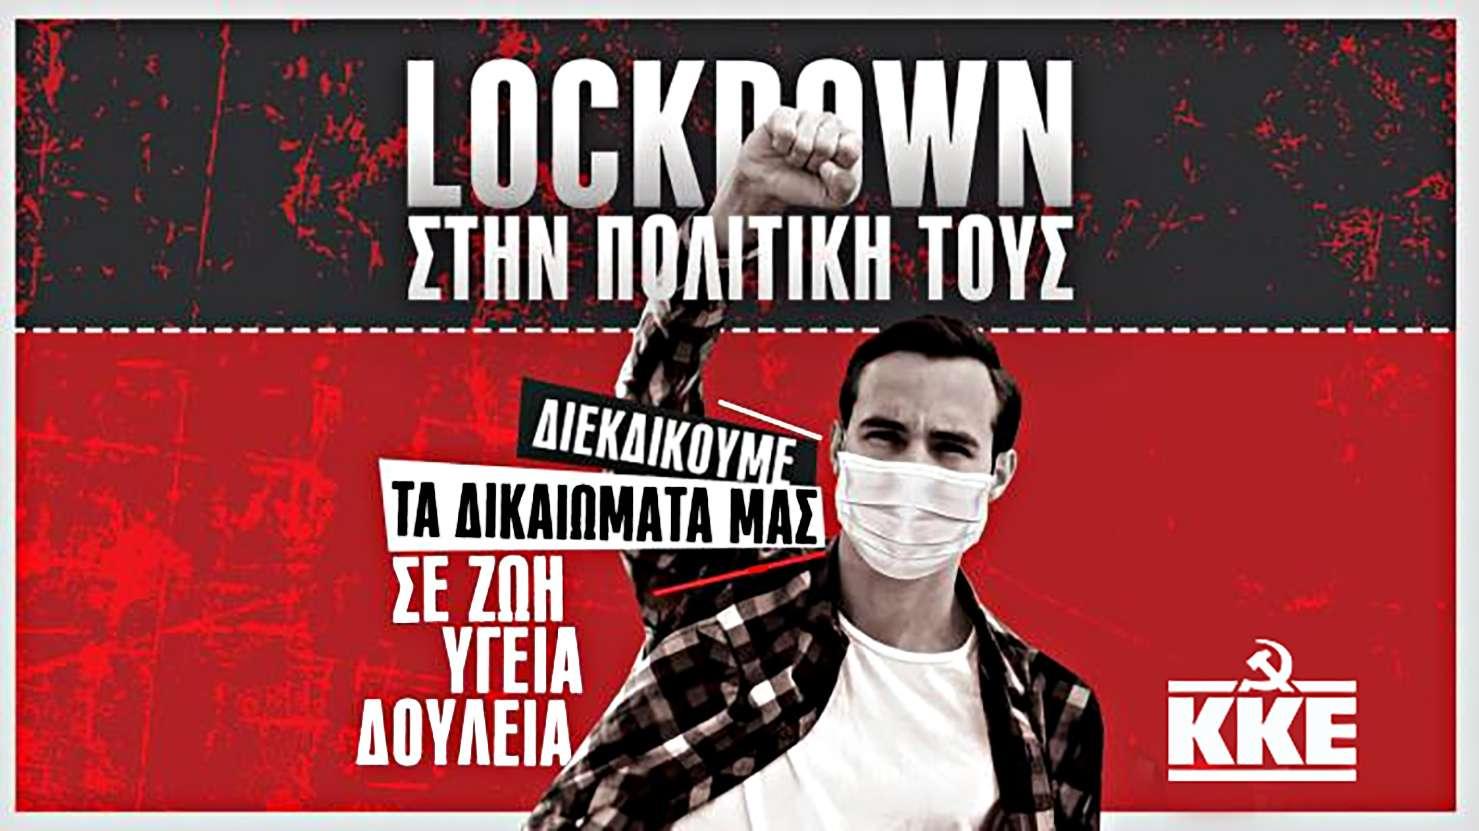 KKE lockgown στην πολιτική τους